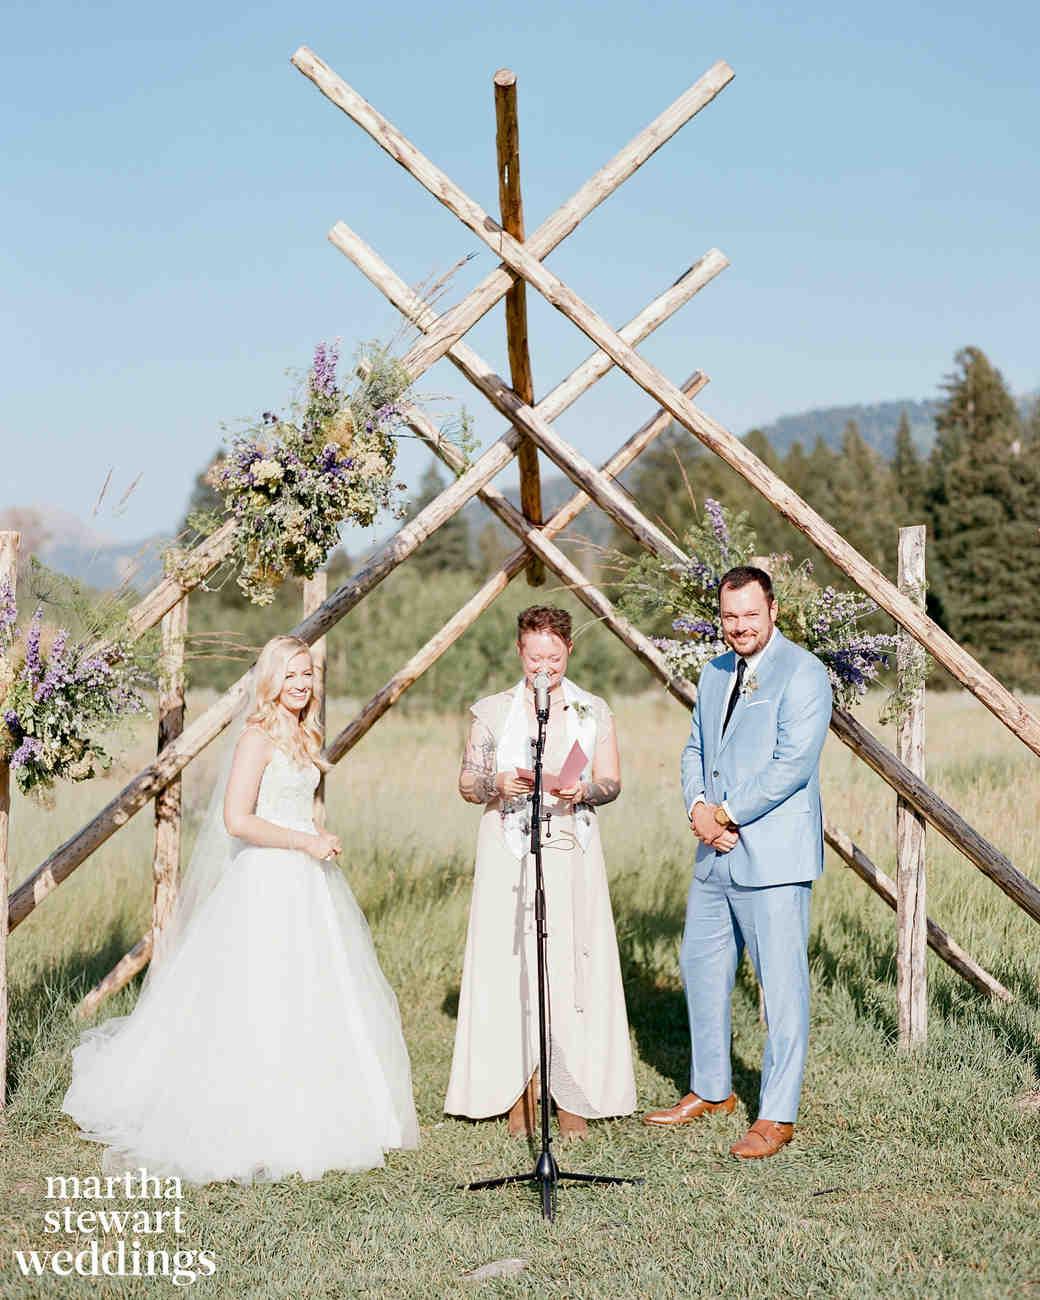 04ec0063e7e5 Beth Behrs and Michael Gladis s Beautiful Wedding Photos